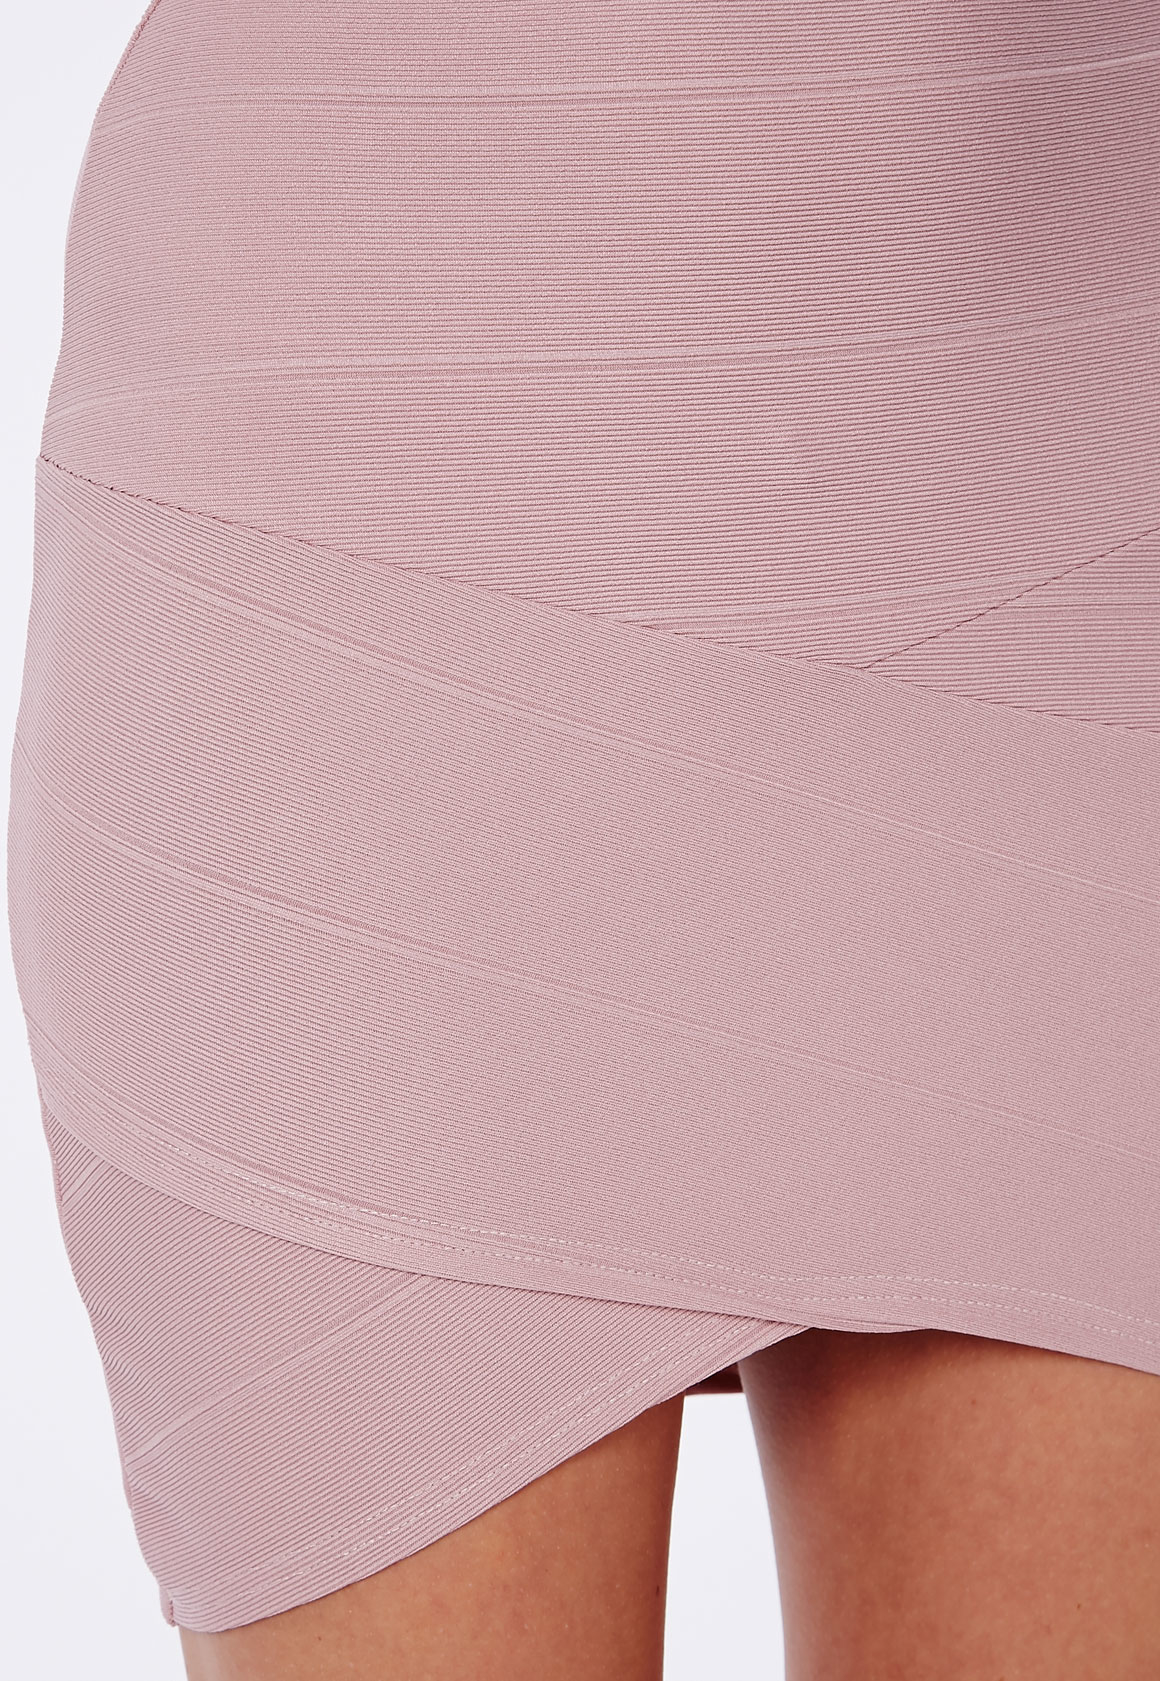 33df6bb700e3 Lyst - Missguided Bandage Asymmetric Hem Mini Skirt Mauve in Pink